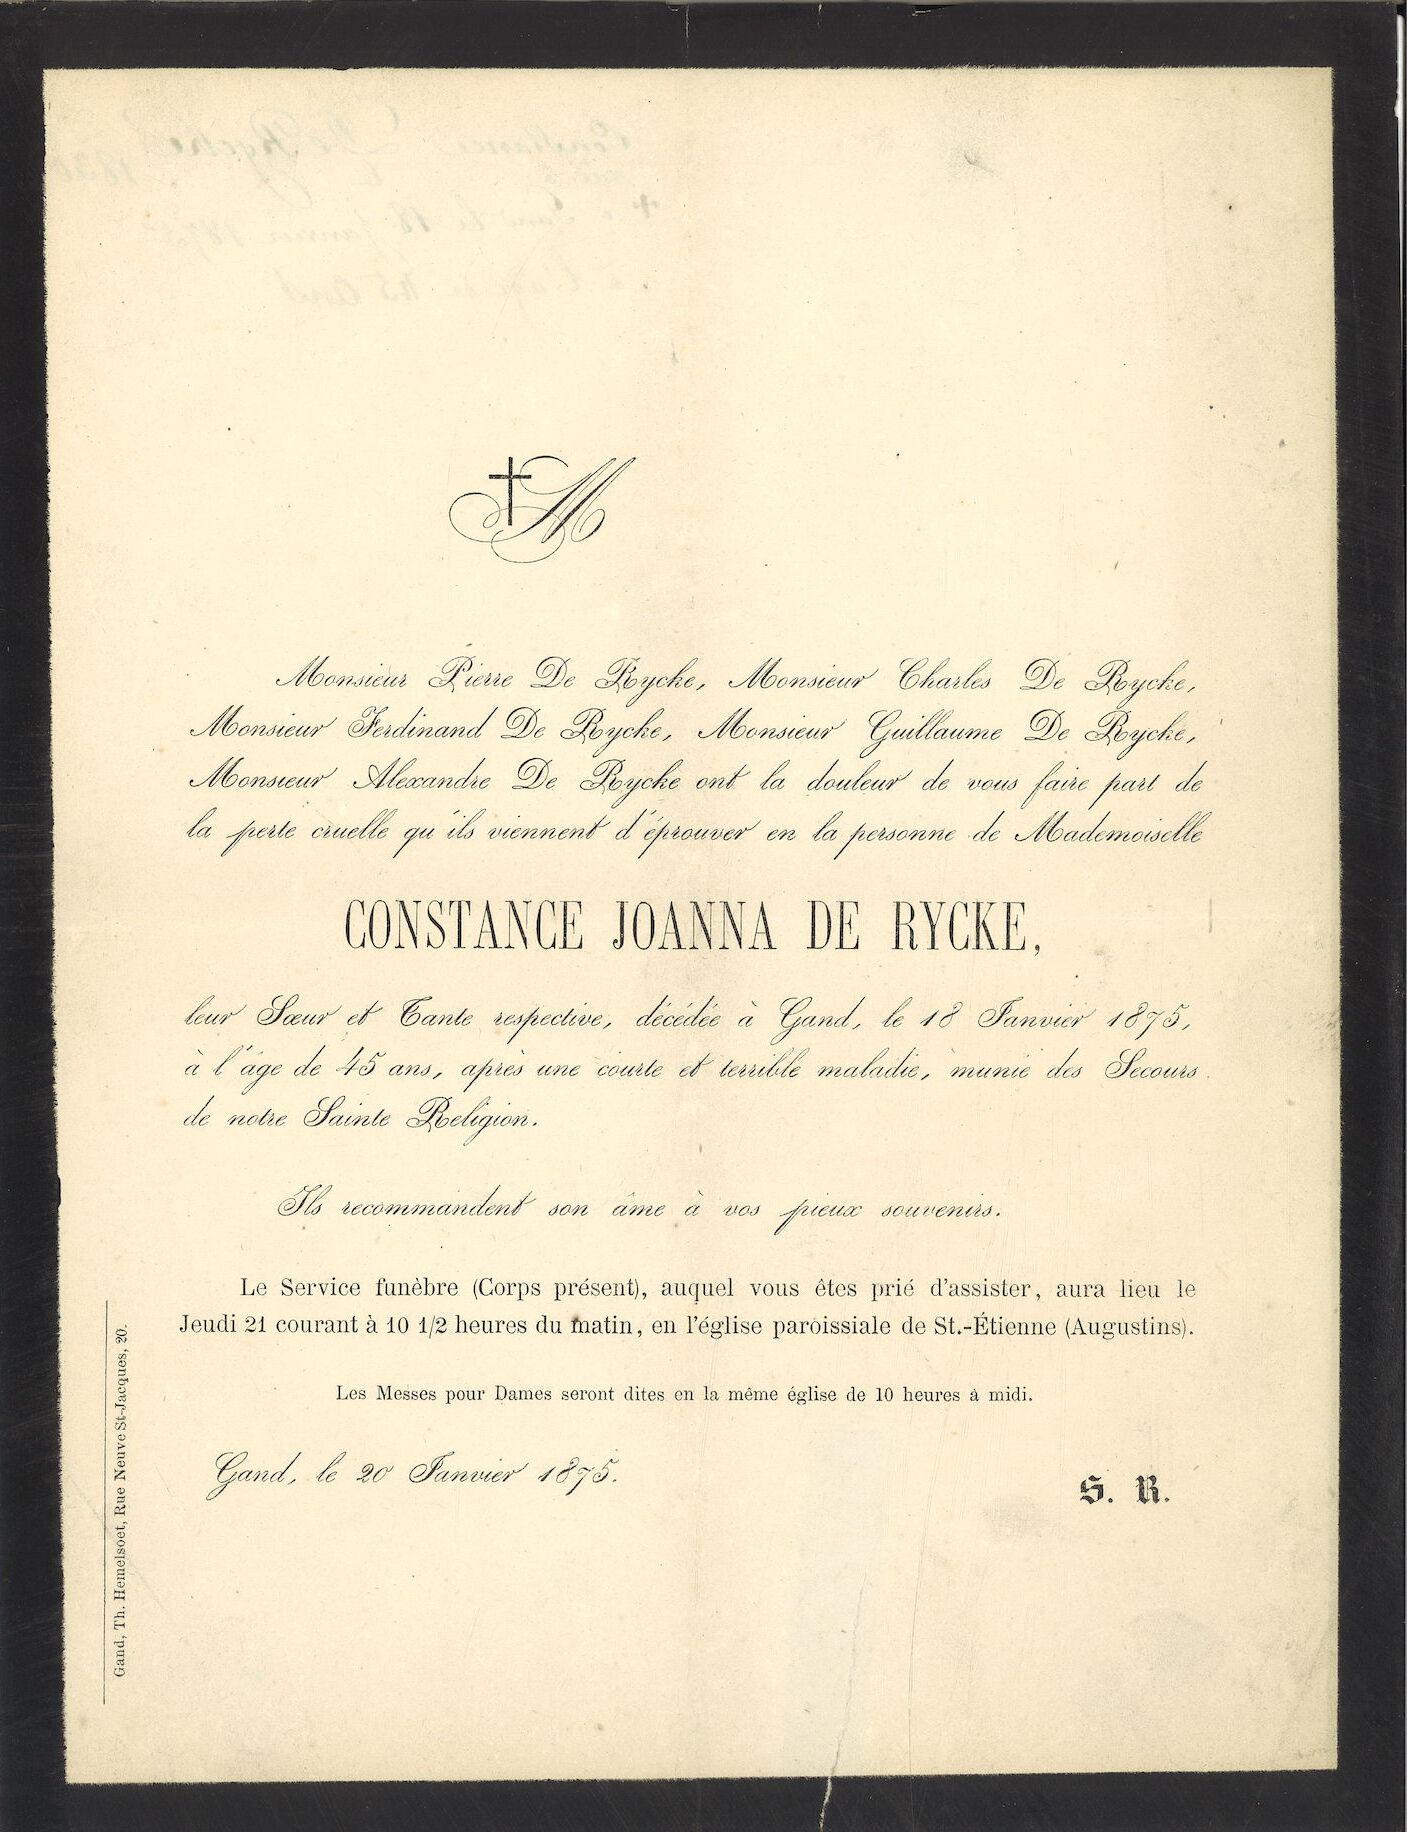 Constance Joanna De Rycke